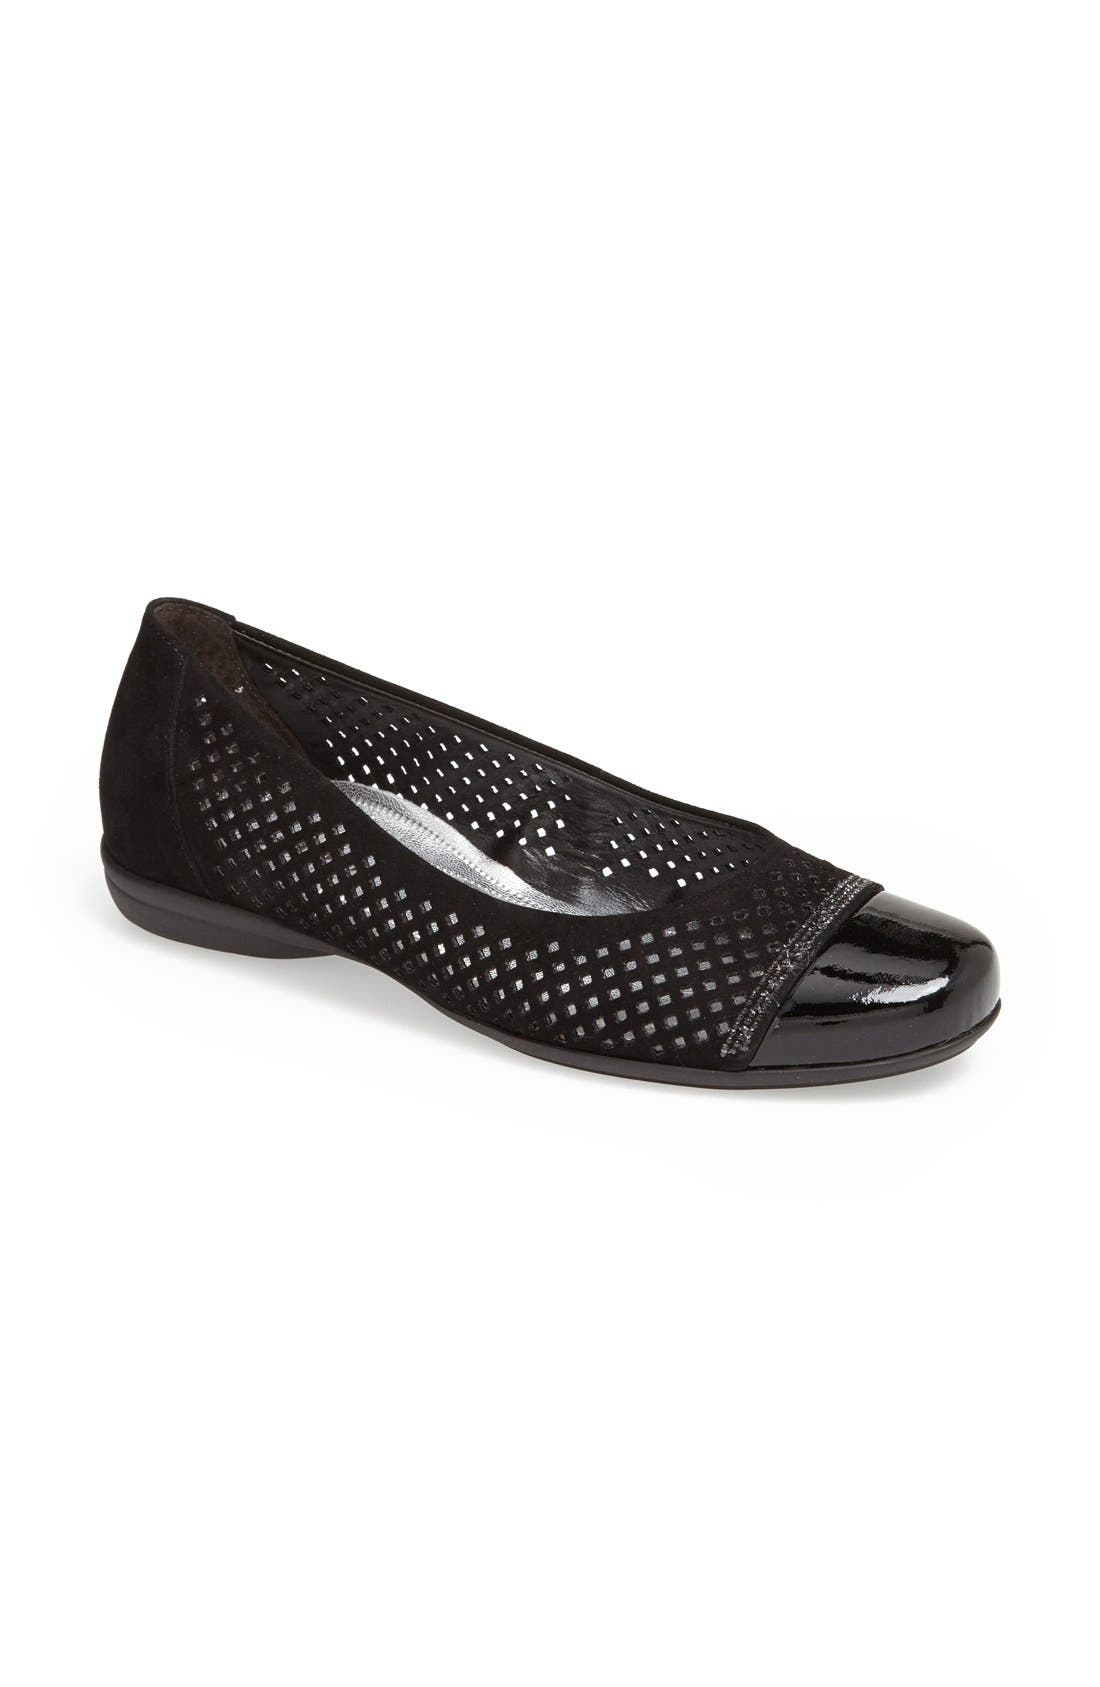 Alternate Image 1 Selected - Gabor Leather Ballet Flat